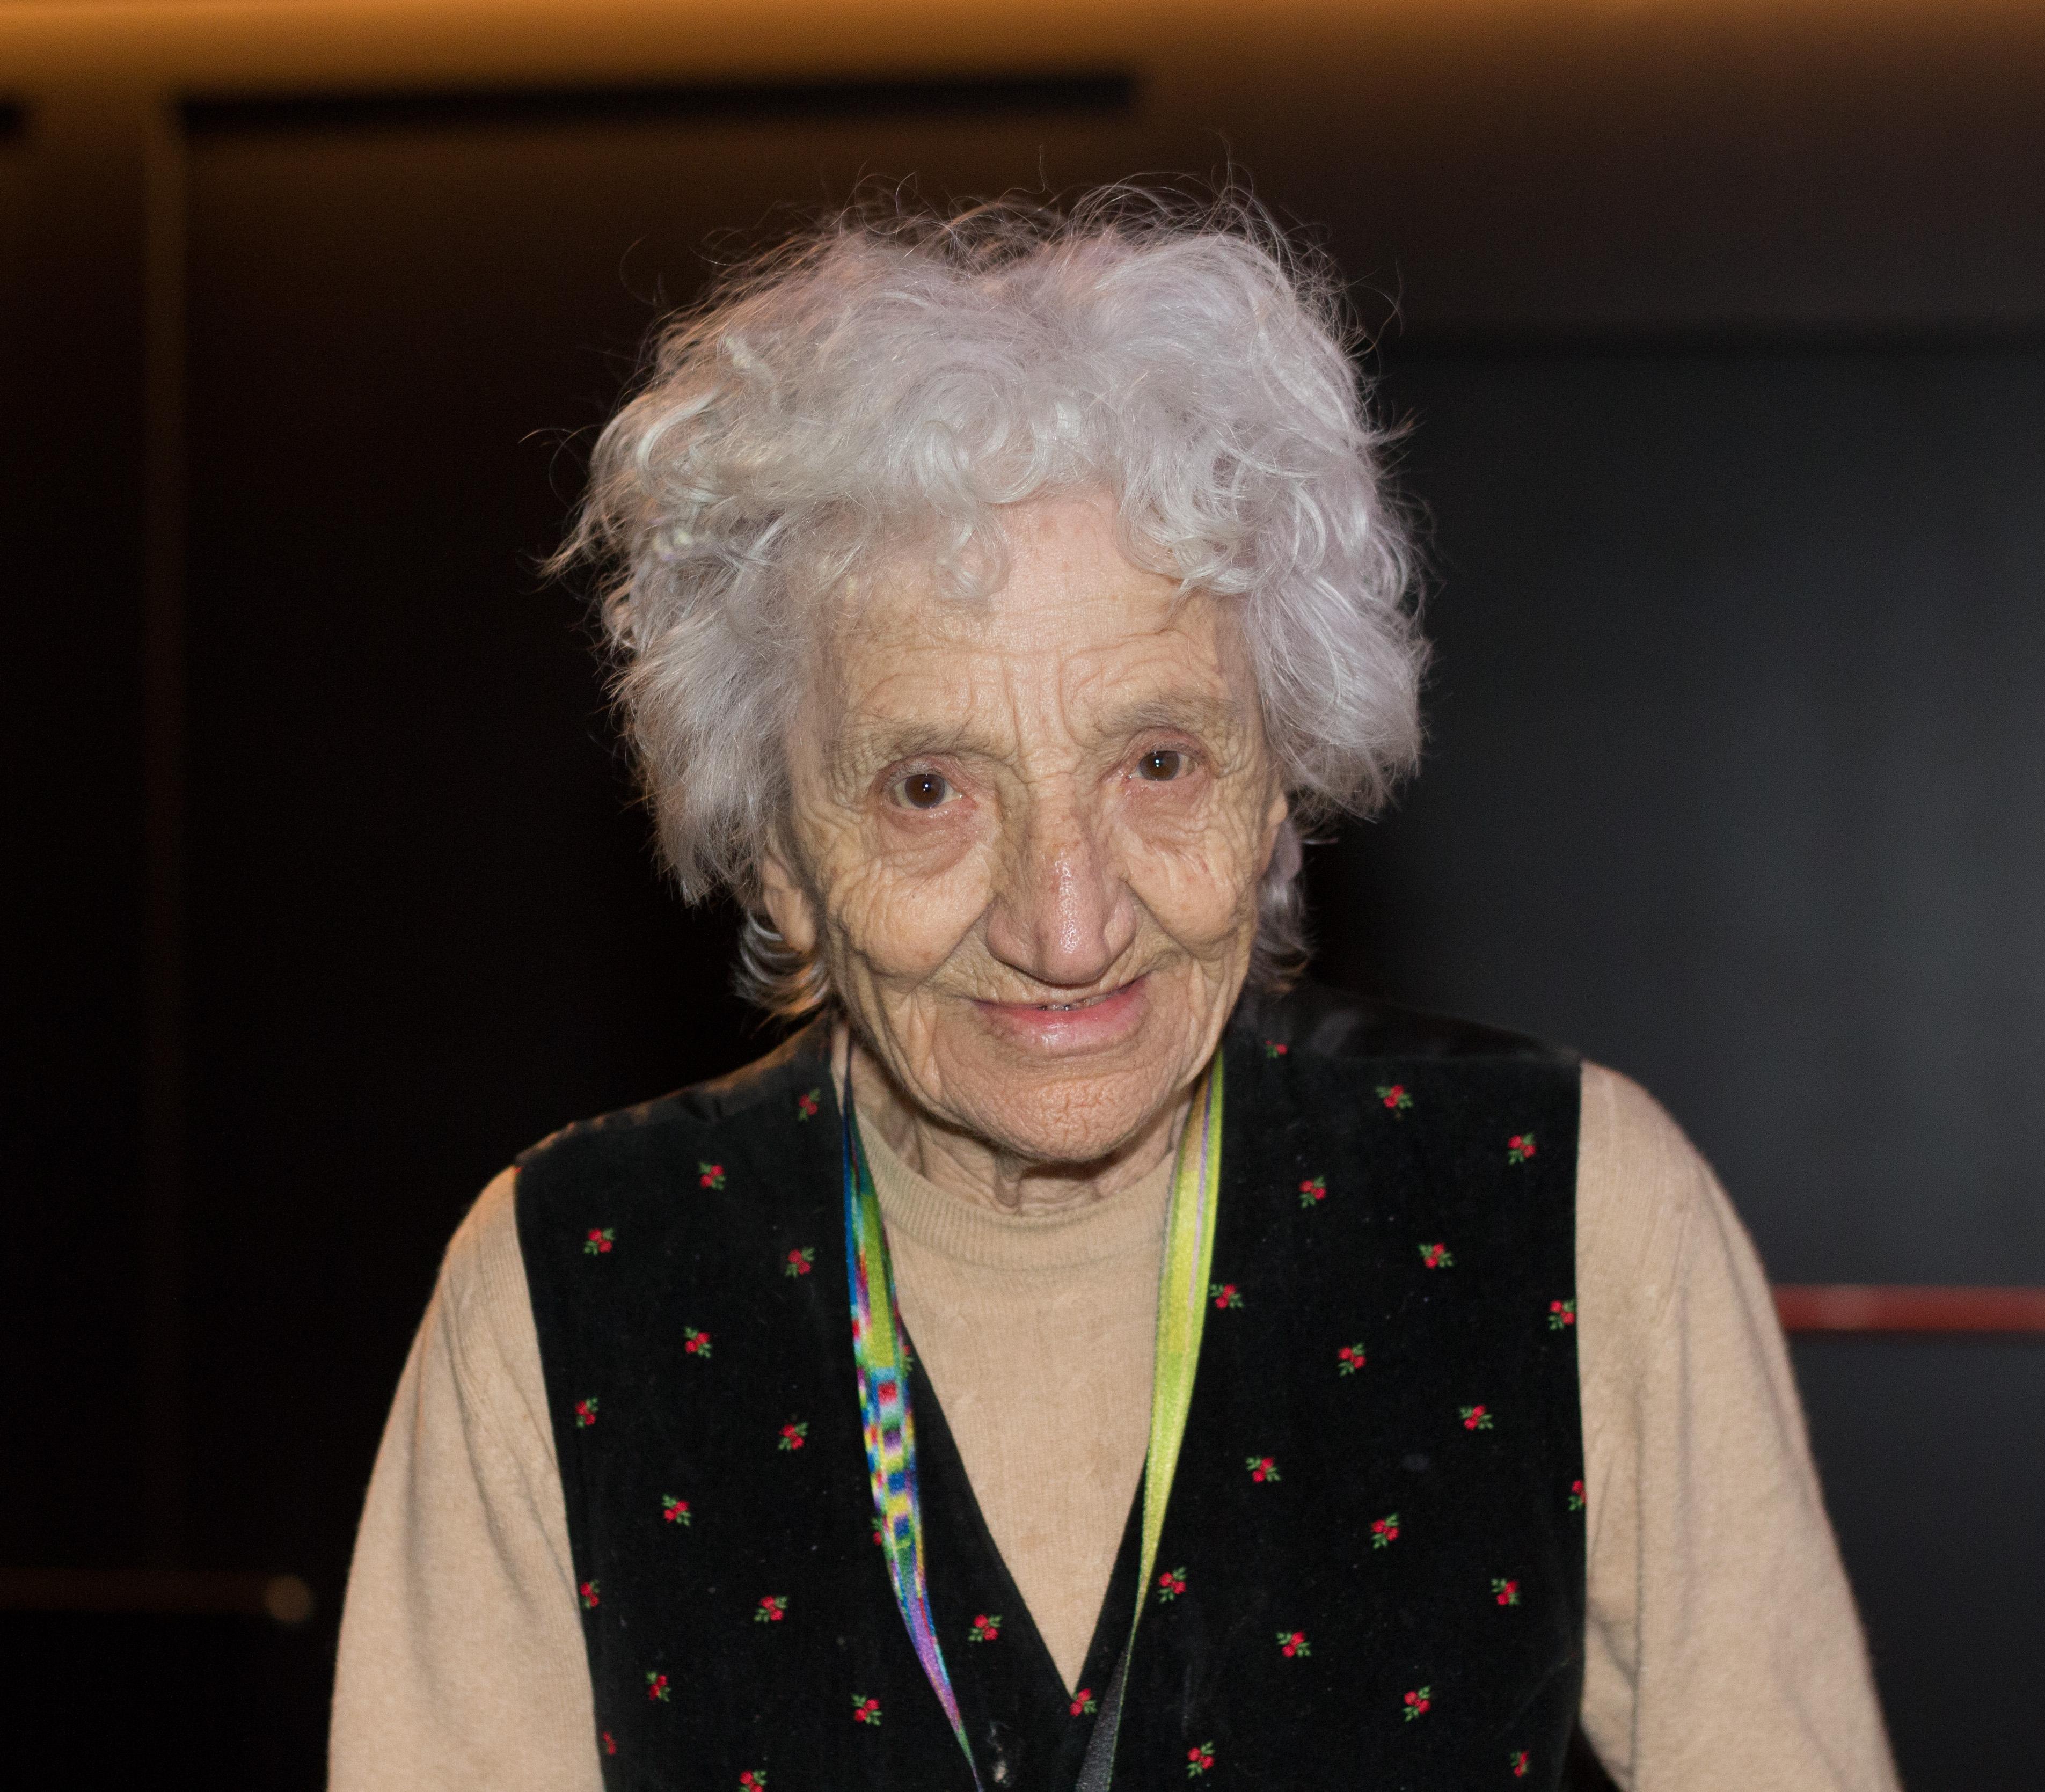 Image of Cecilia Mangini from Wikidata